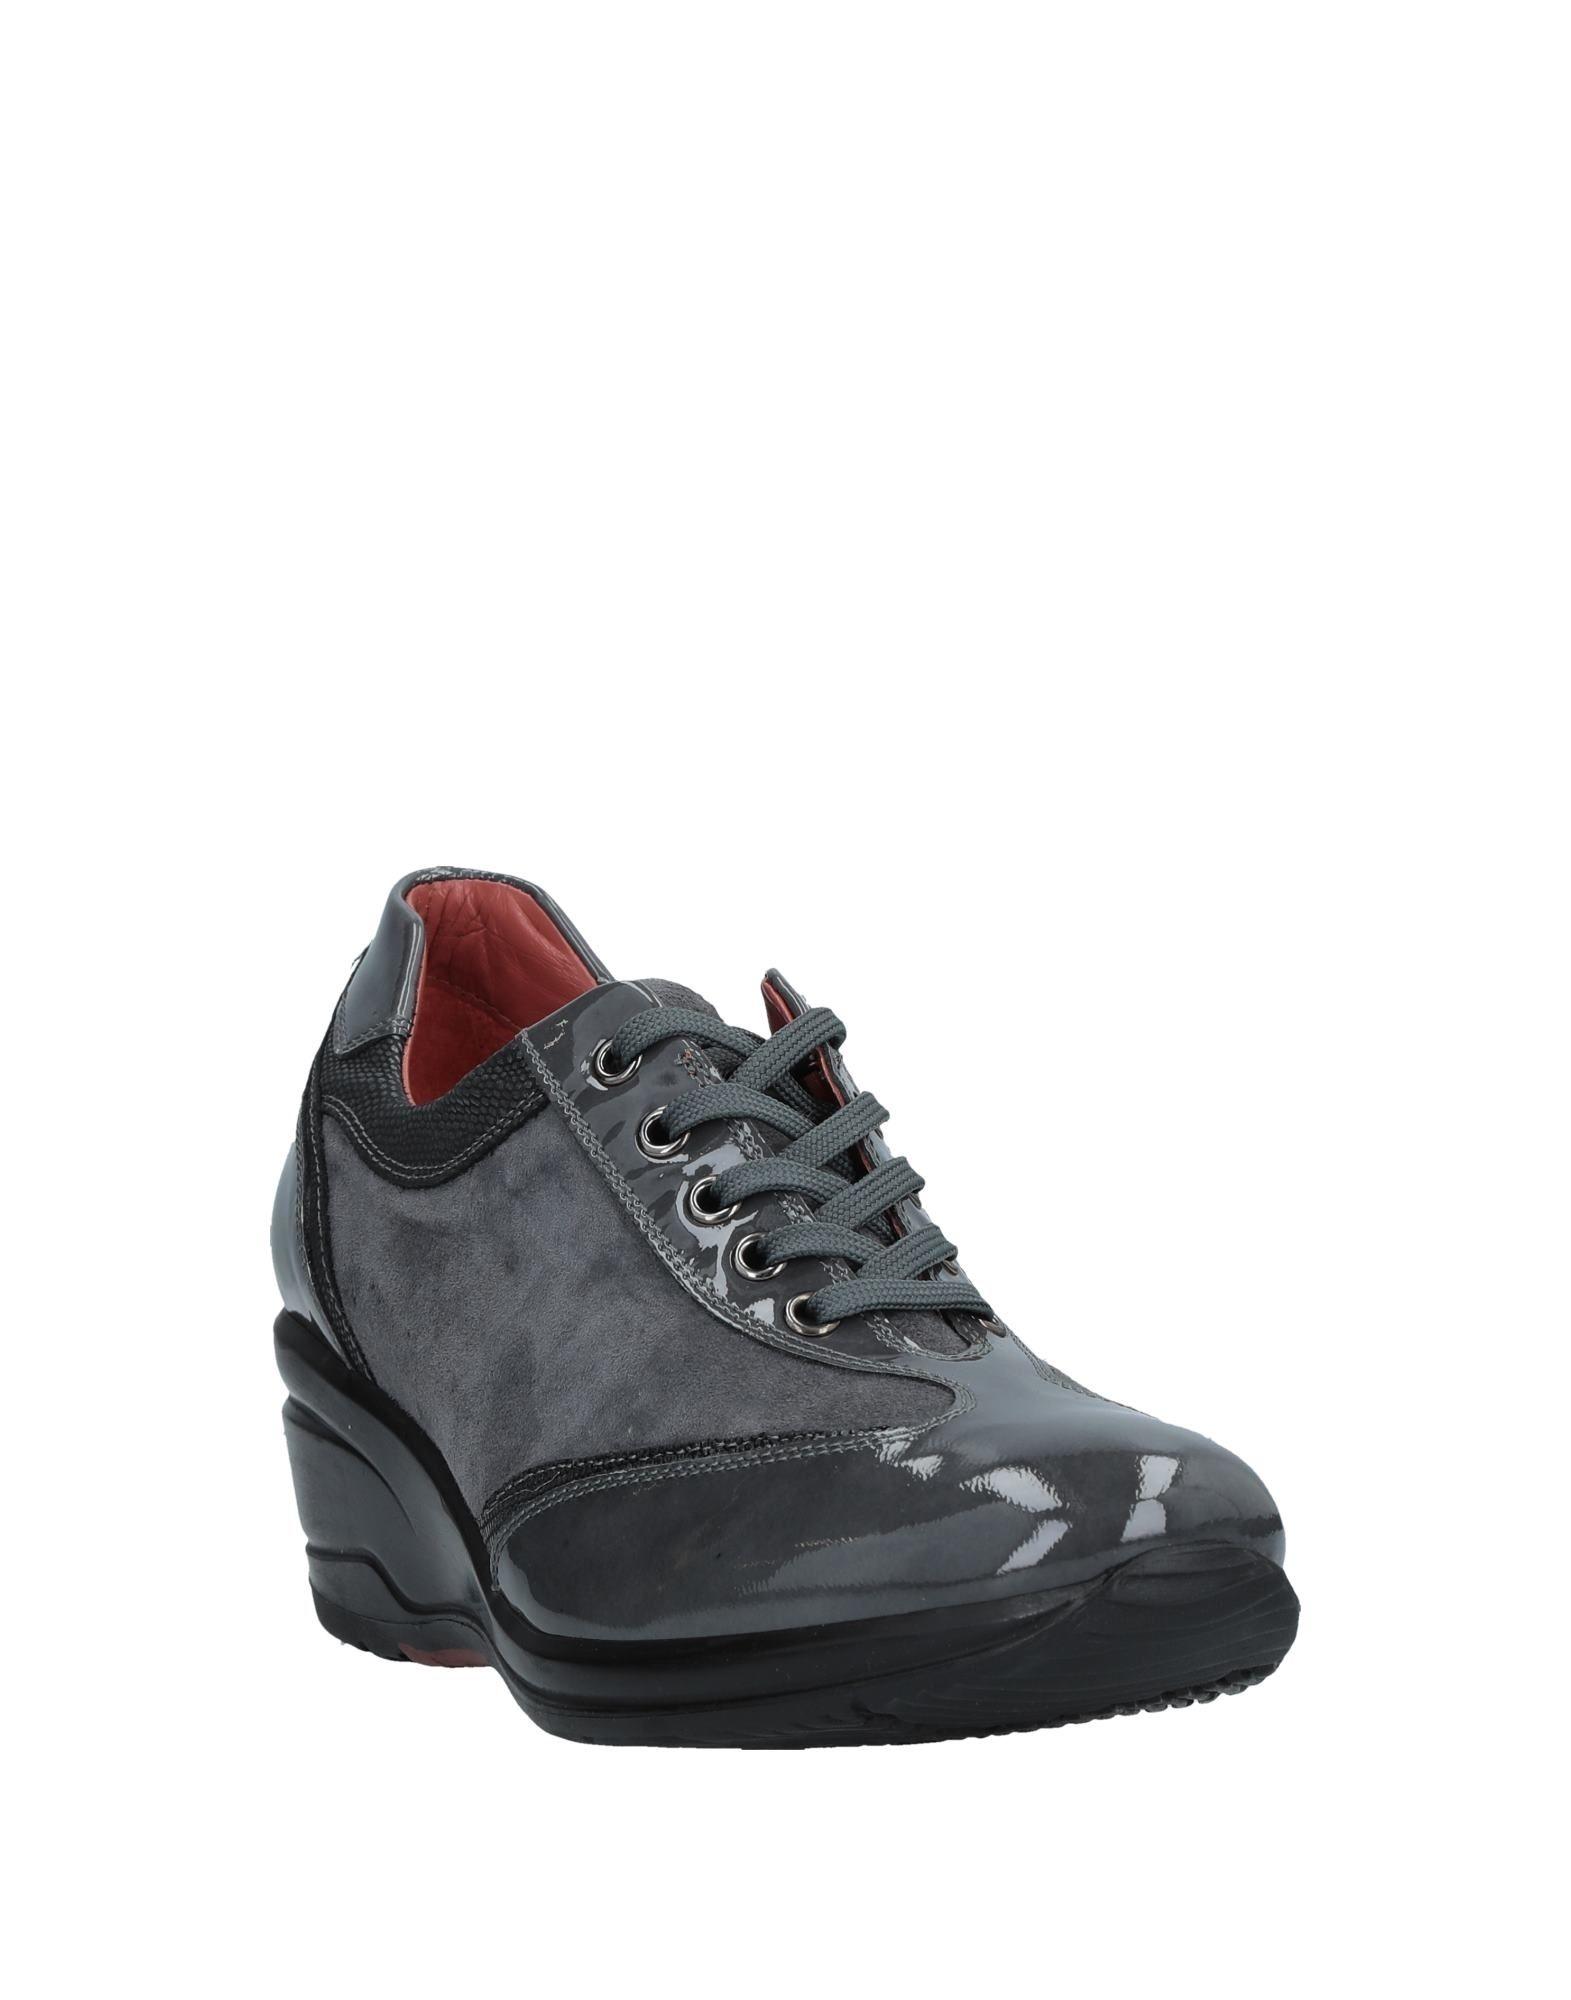 Lionelle Sneakers Damen  beliebte 11529438DS Gute Qualität beliebte  Schuhe a04ee5